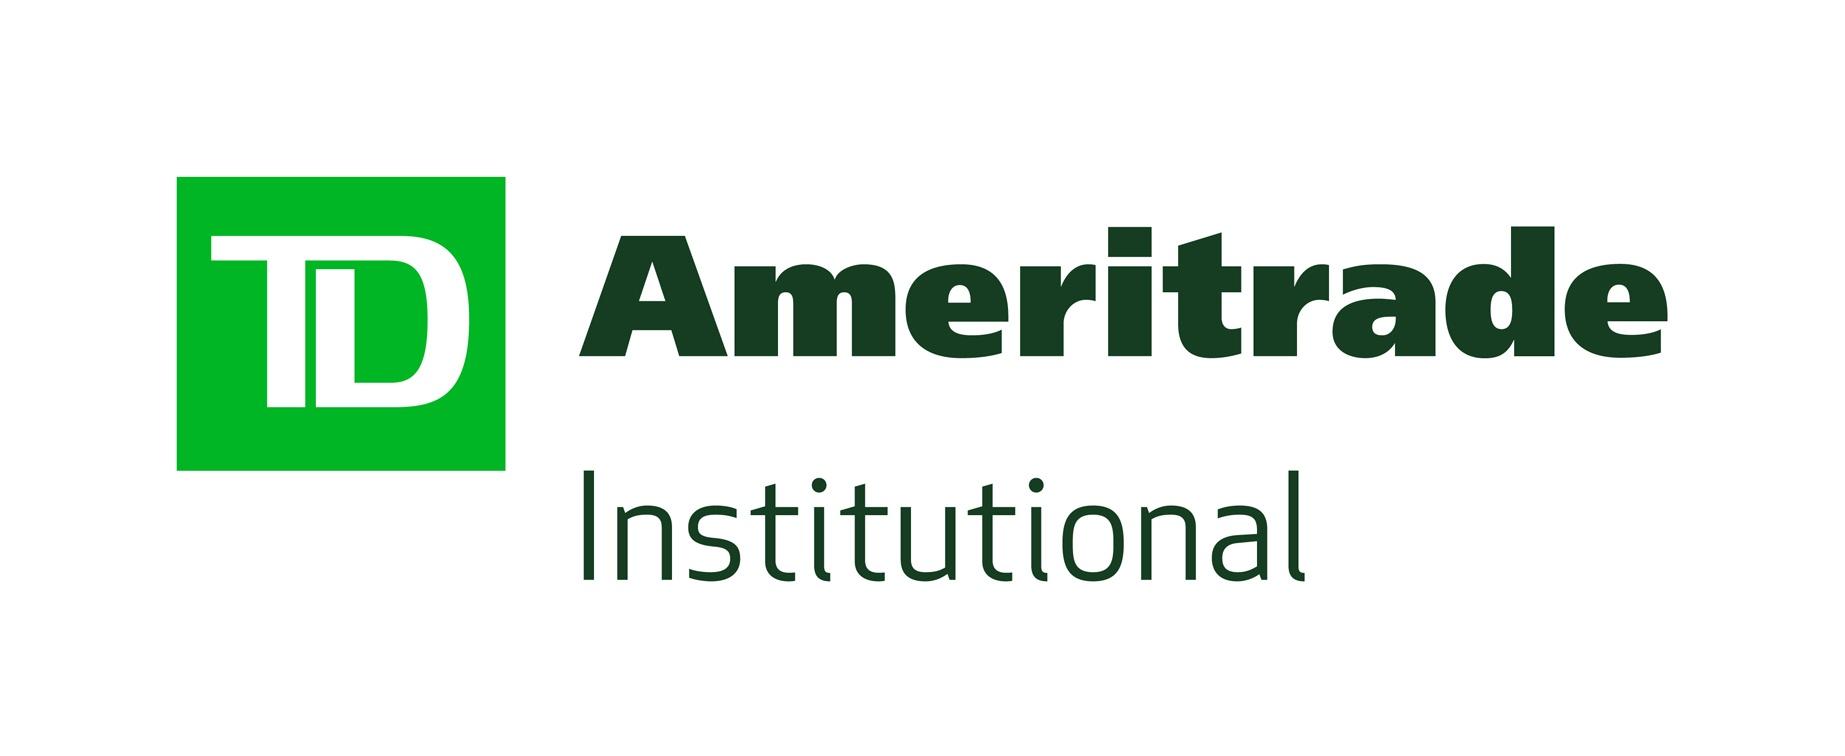 td_ameritrade_institutional_logo